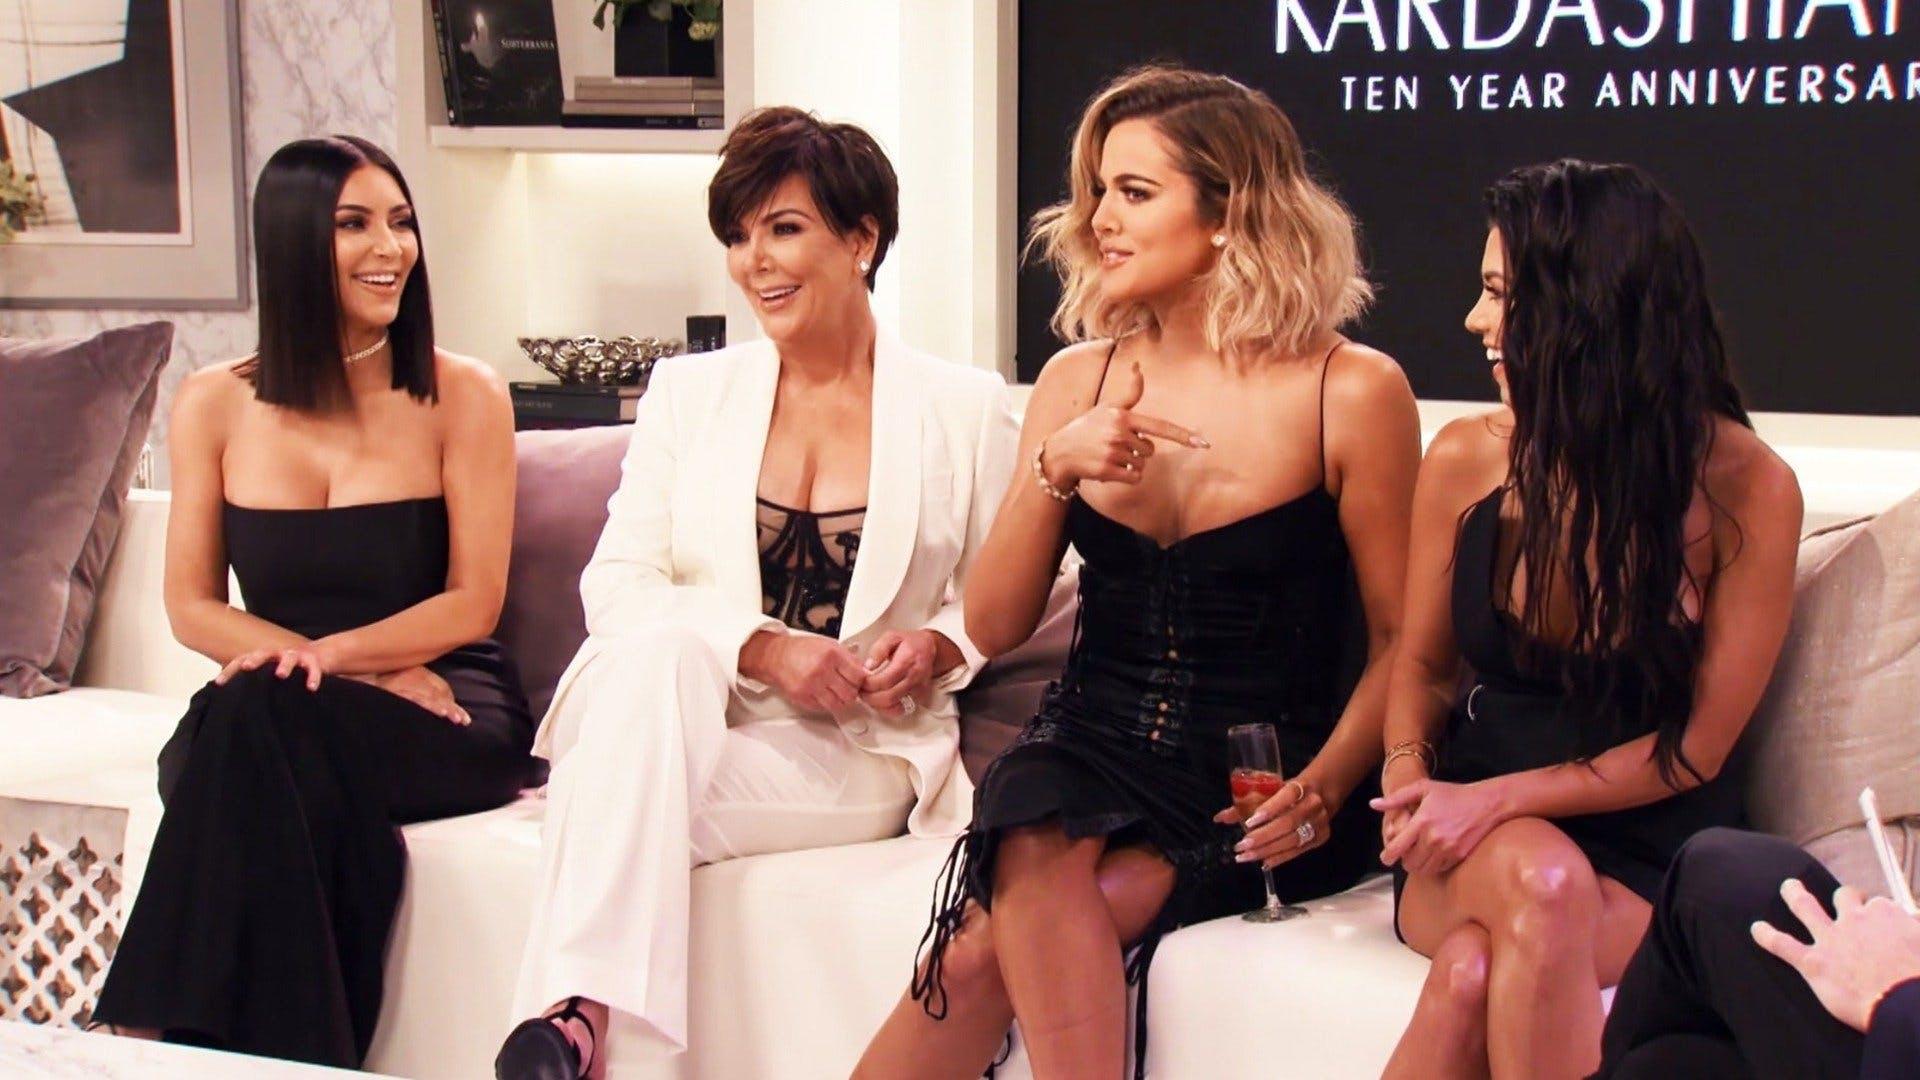 Keeping Up with The Kardashians Season 14 Episode 0